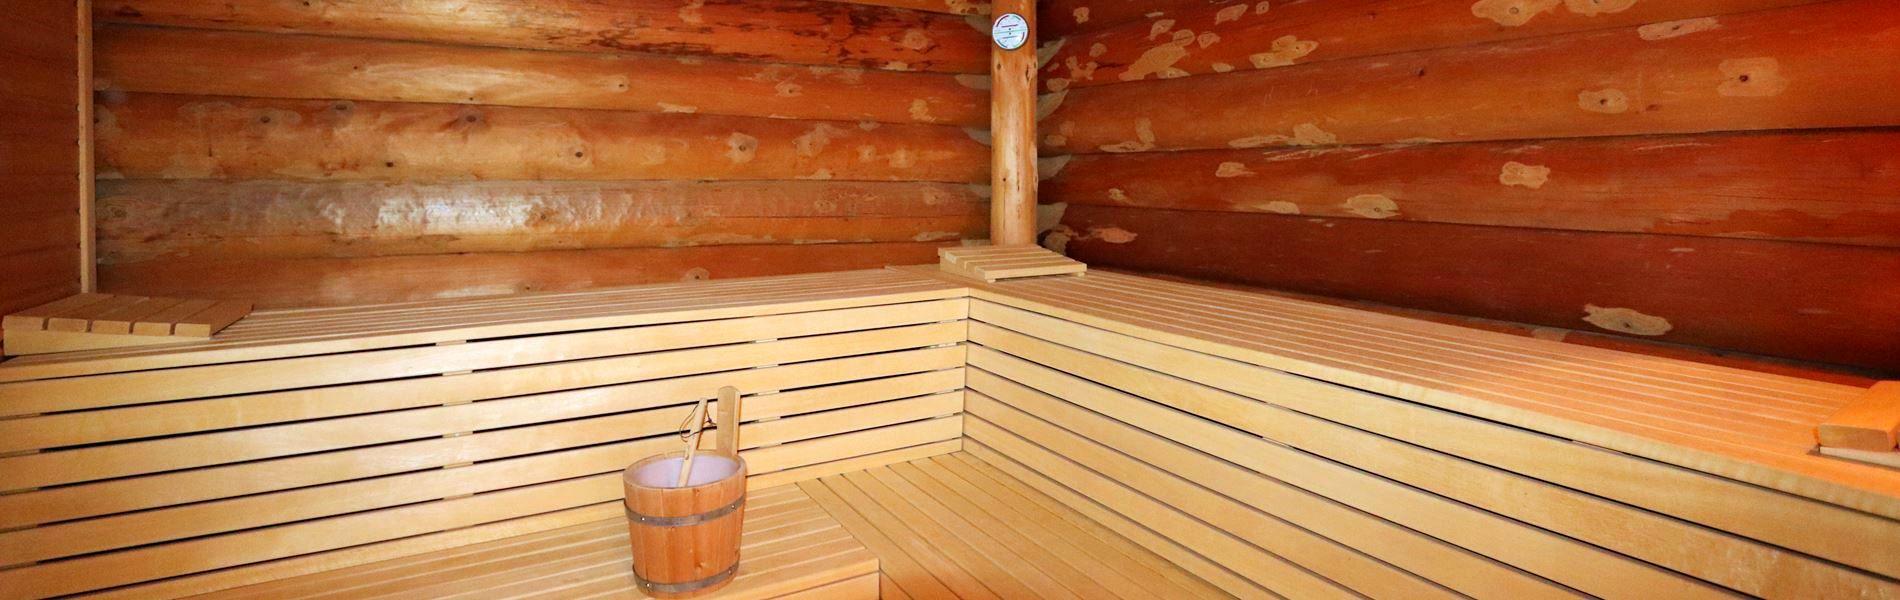 sauna-stabhalterhof-wellness